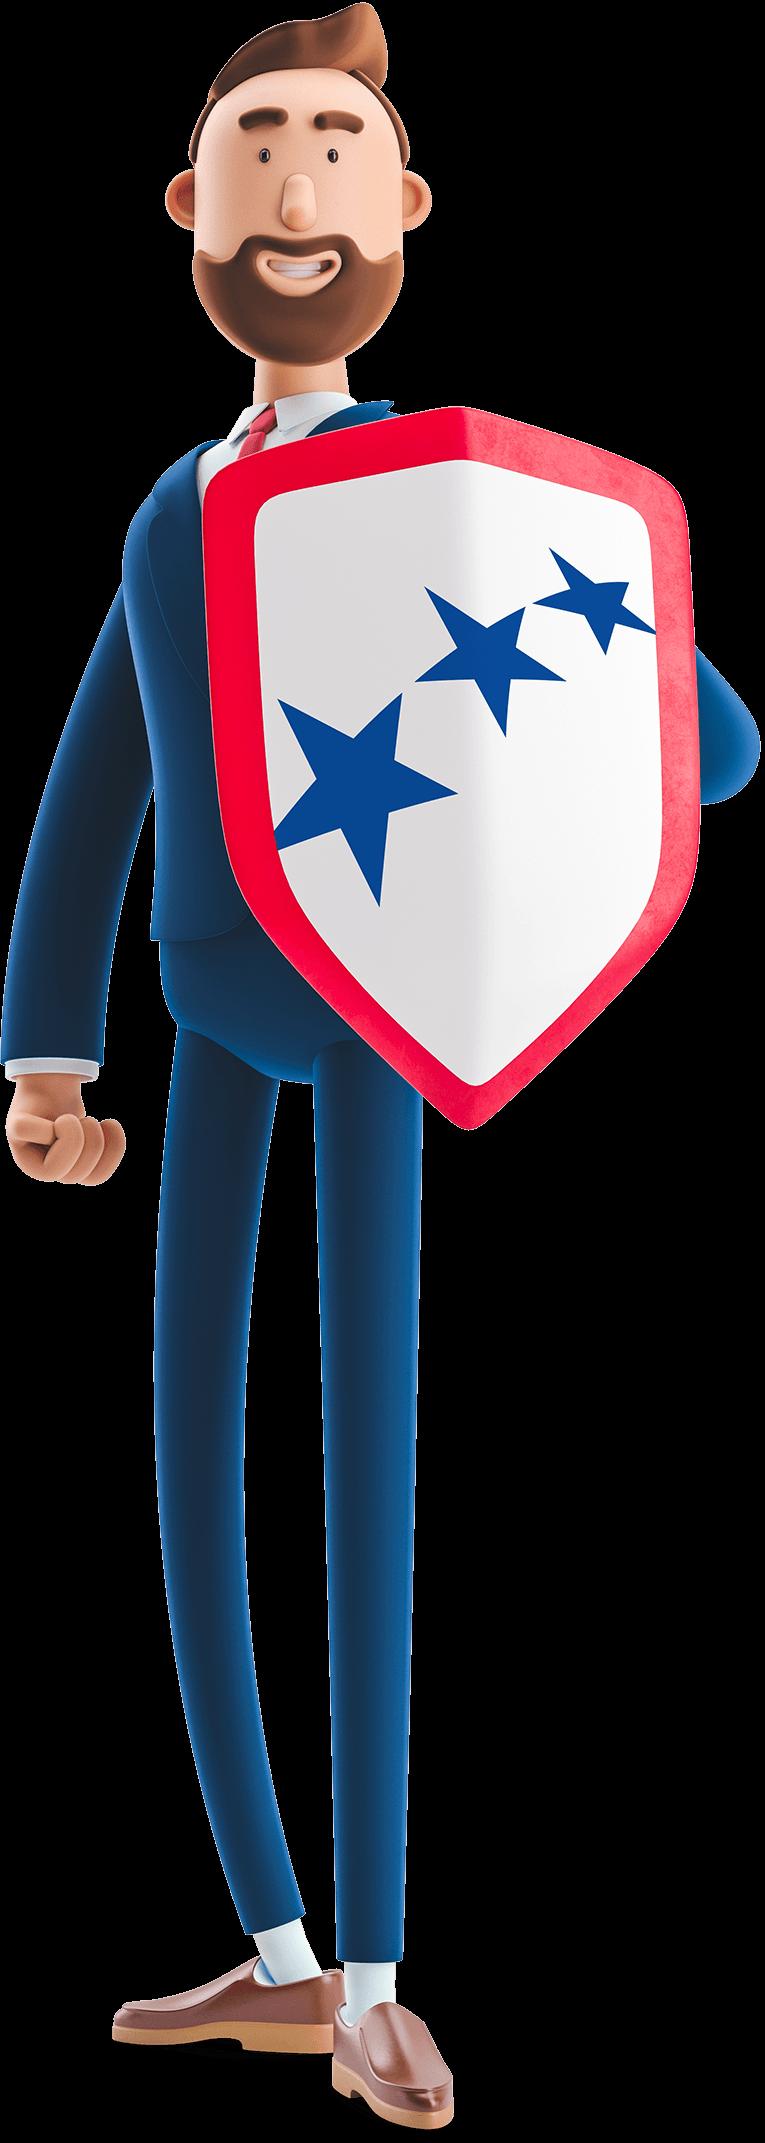 Billy holding a shield